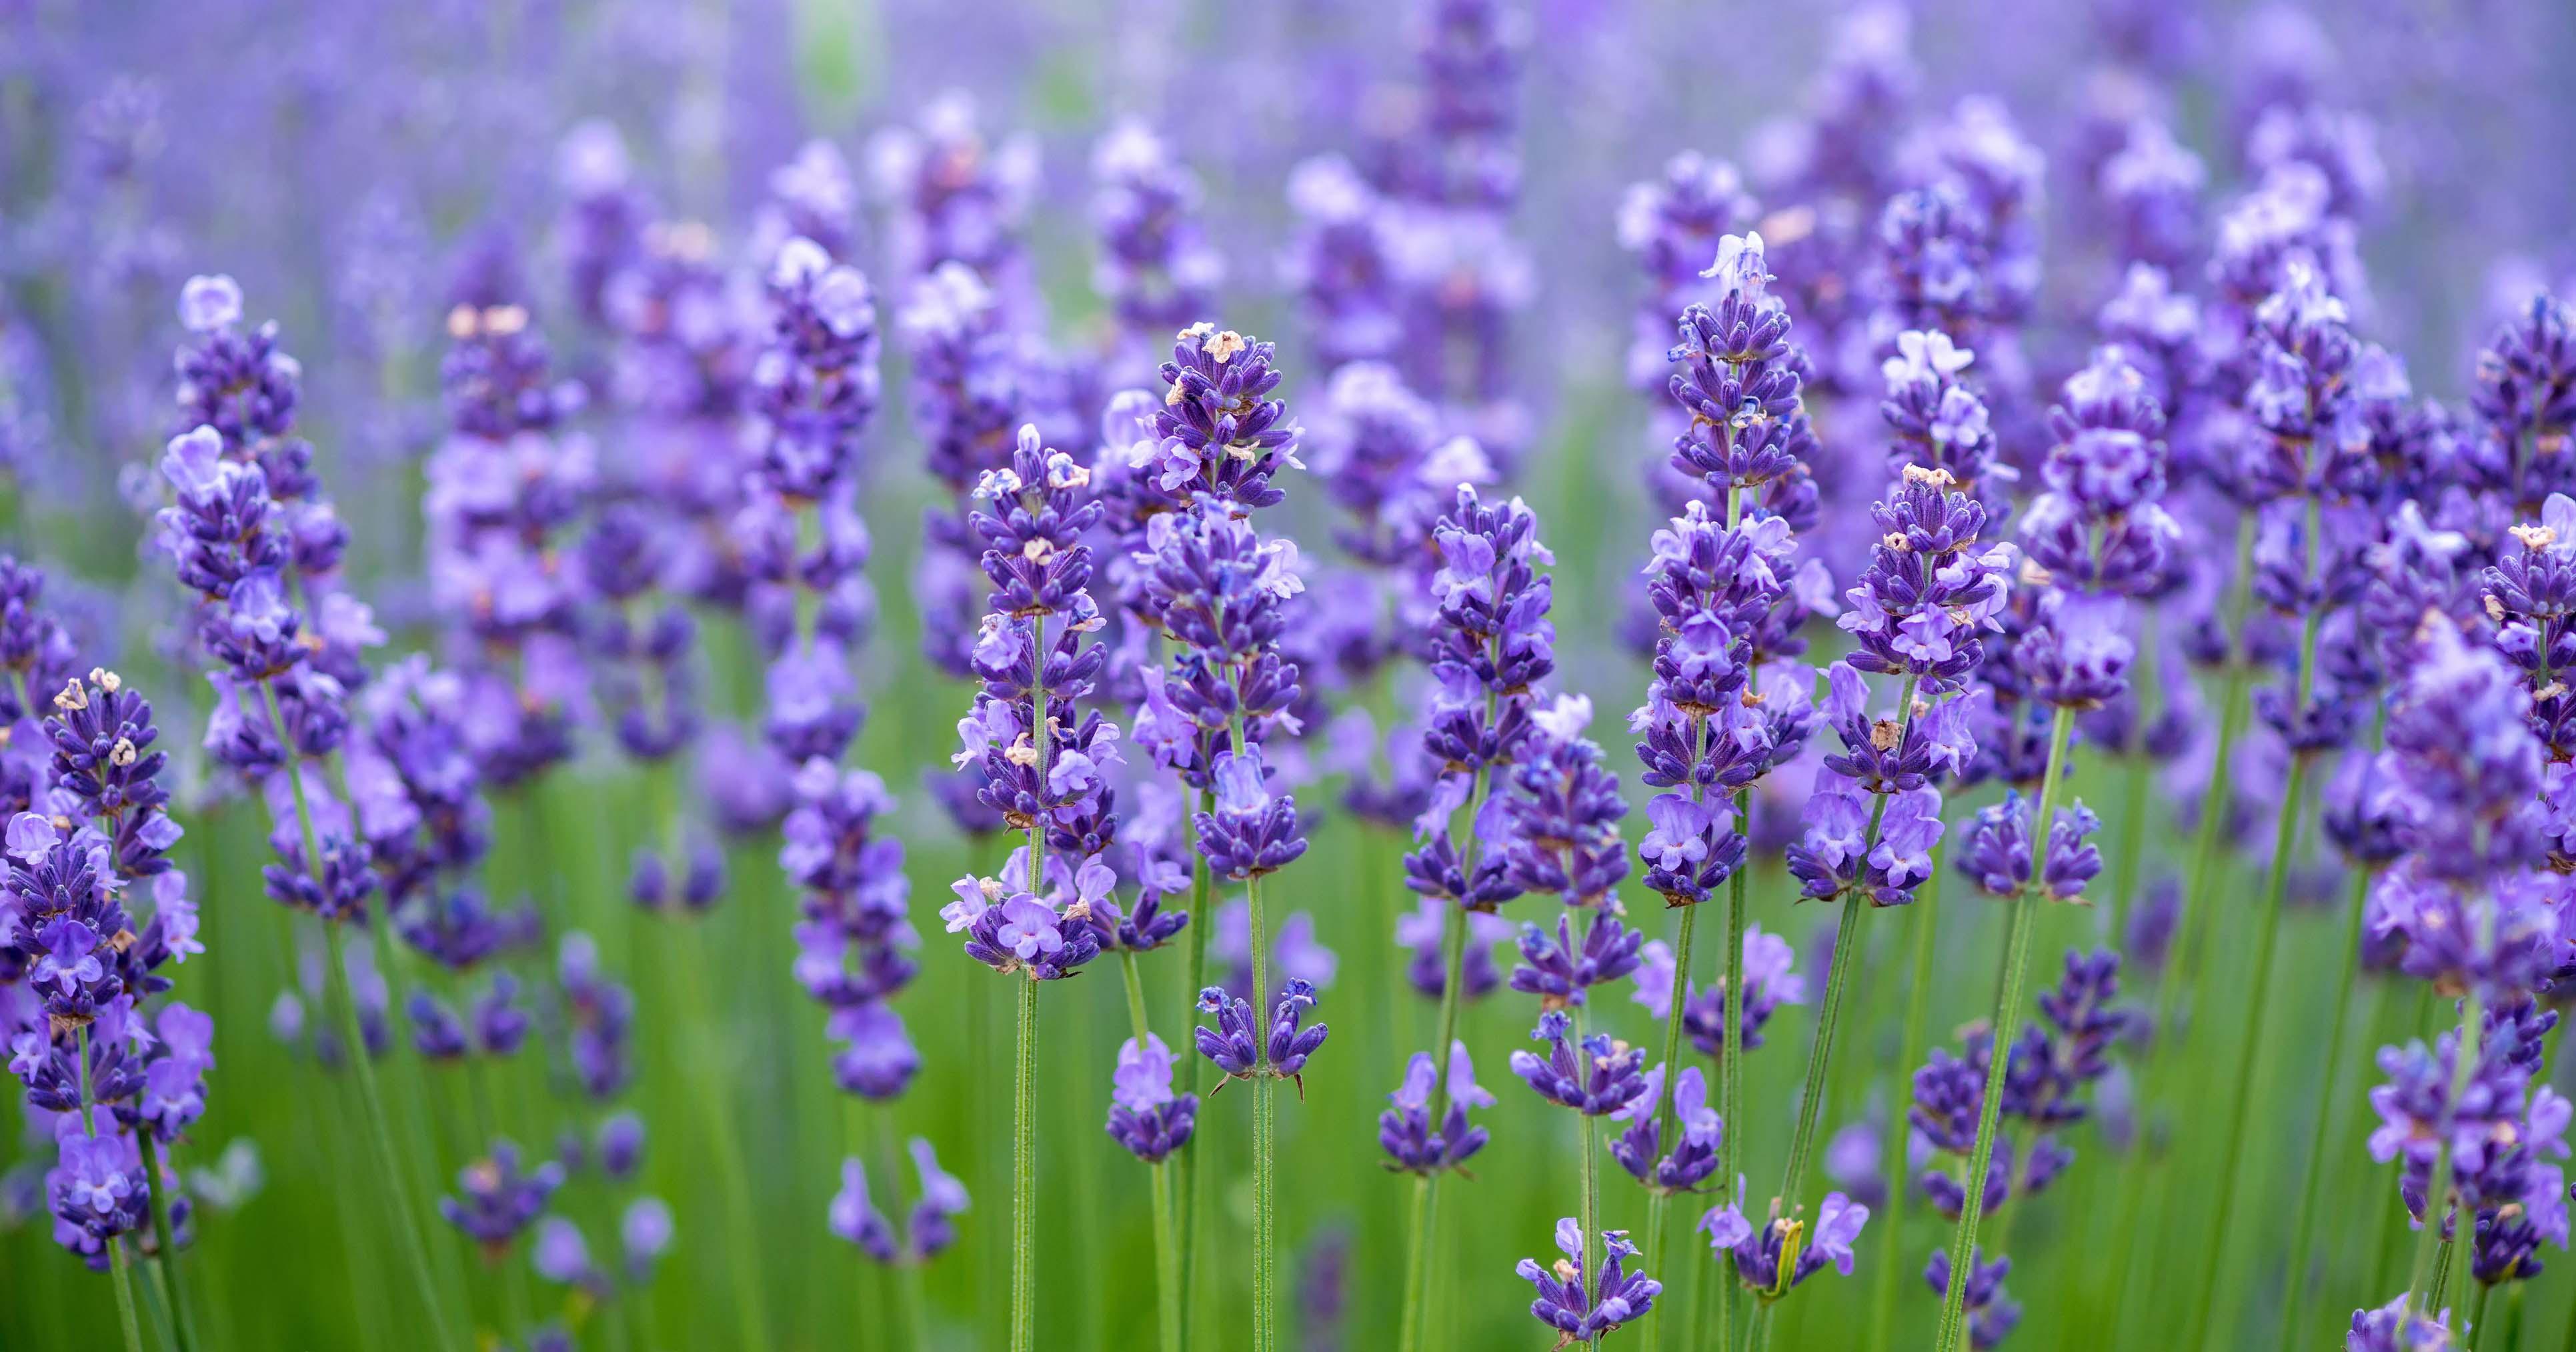 meadow of lavender nature composition selective royalty free image 539988160 1533825462 307606d656d5d53227ae28f44999c679 - Menanam Bunga Lavender di Pot